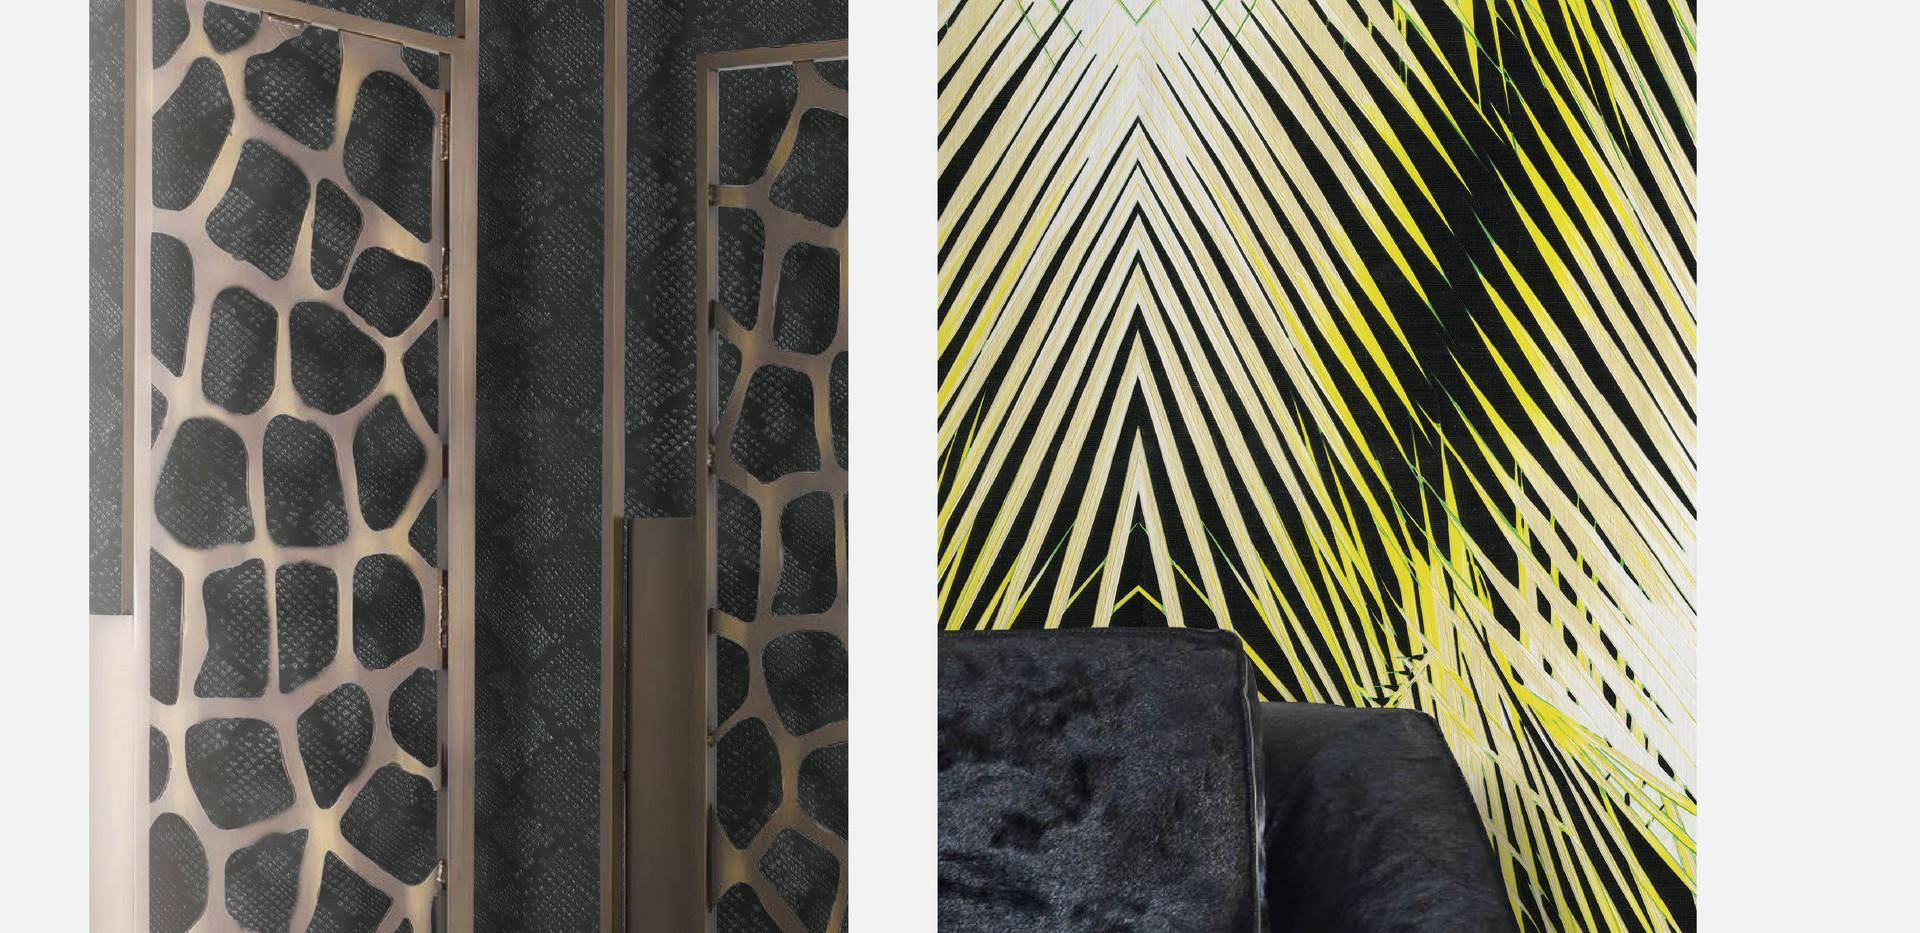 LifeNcolors-best-wallpaper-branded-luxury-pattern-snakeskin-leather